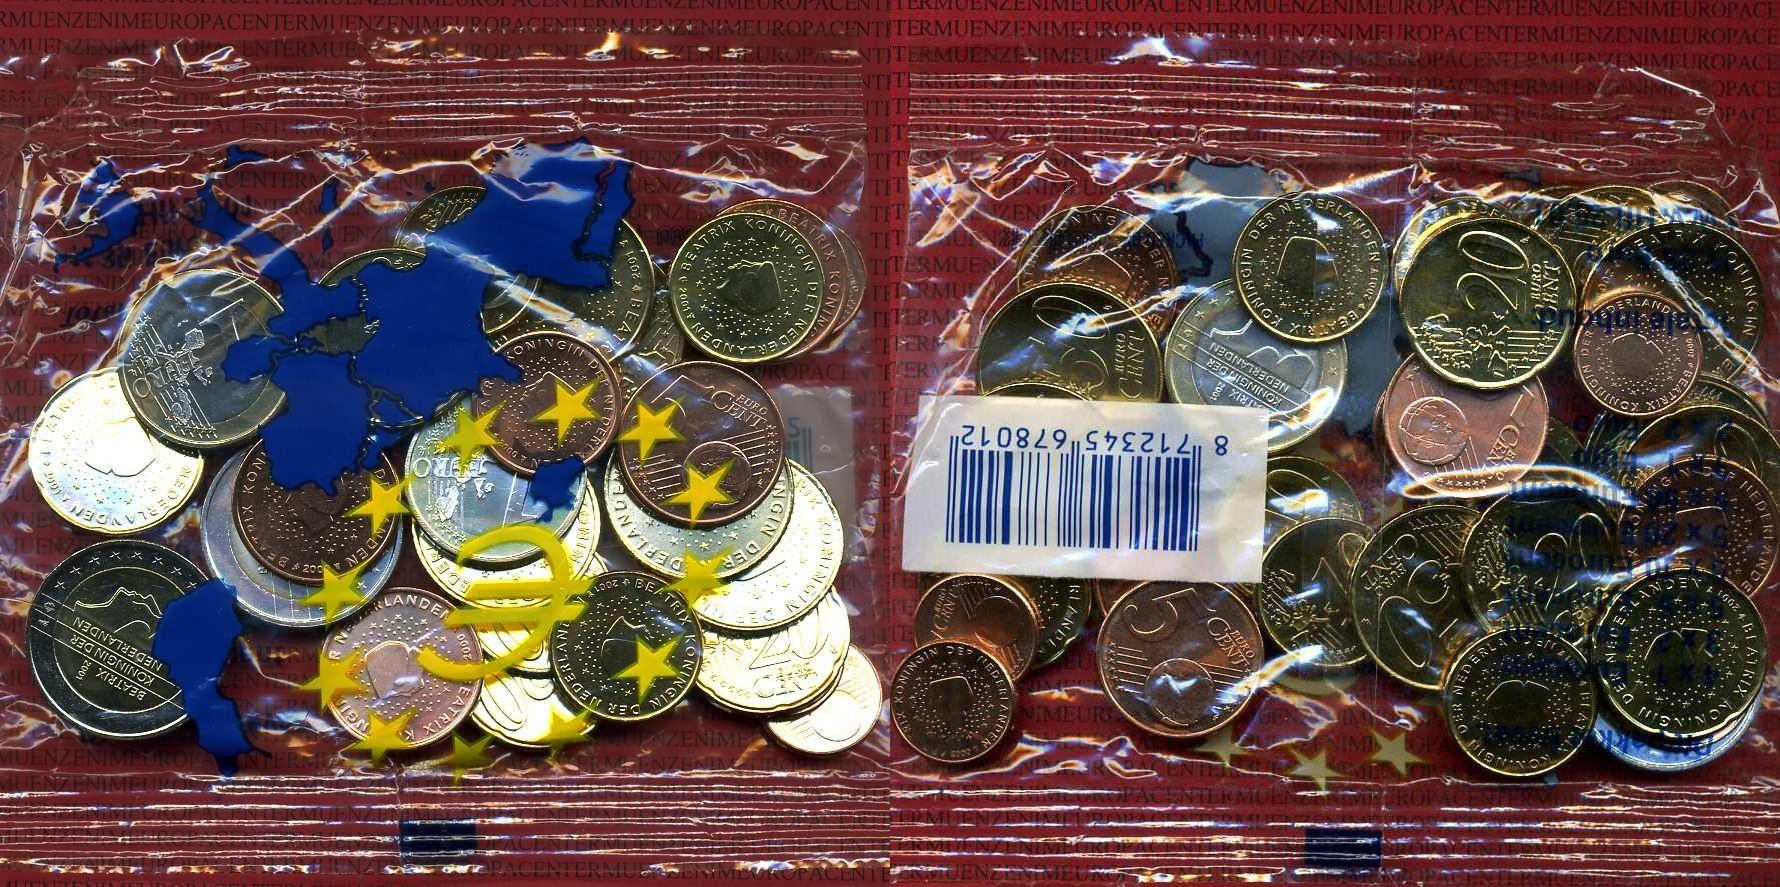 Starterkit 11,35 Euro Nominalwert 2001 Niederlande Starterkit Ovp